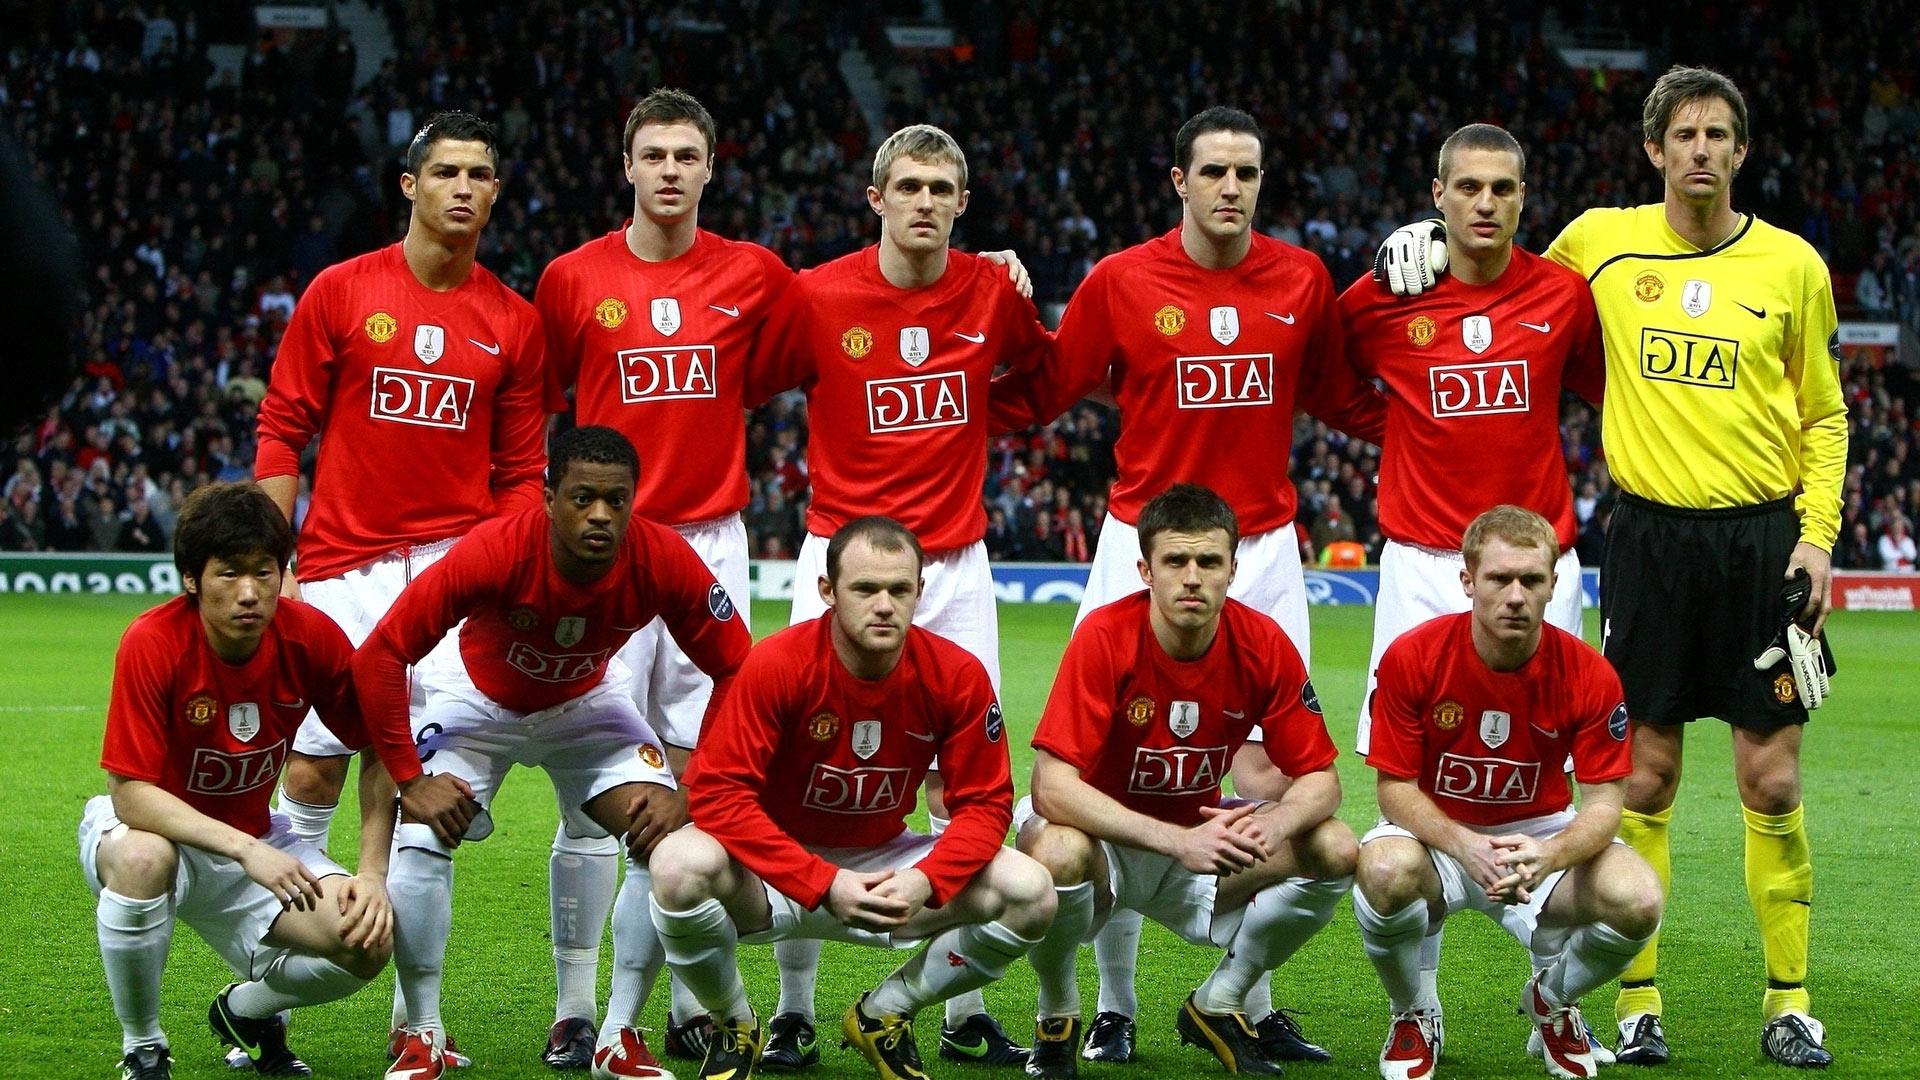 Обои Манчестер Юнайтед, картинки - Обои для рабочего стола ...: http://www.fullhdoboi.ru/photo/sport/manchester_junajted/7-0-6999